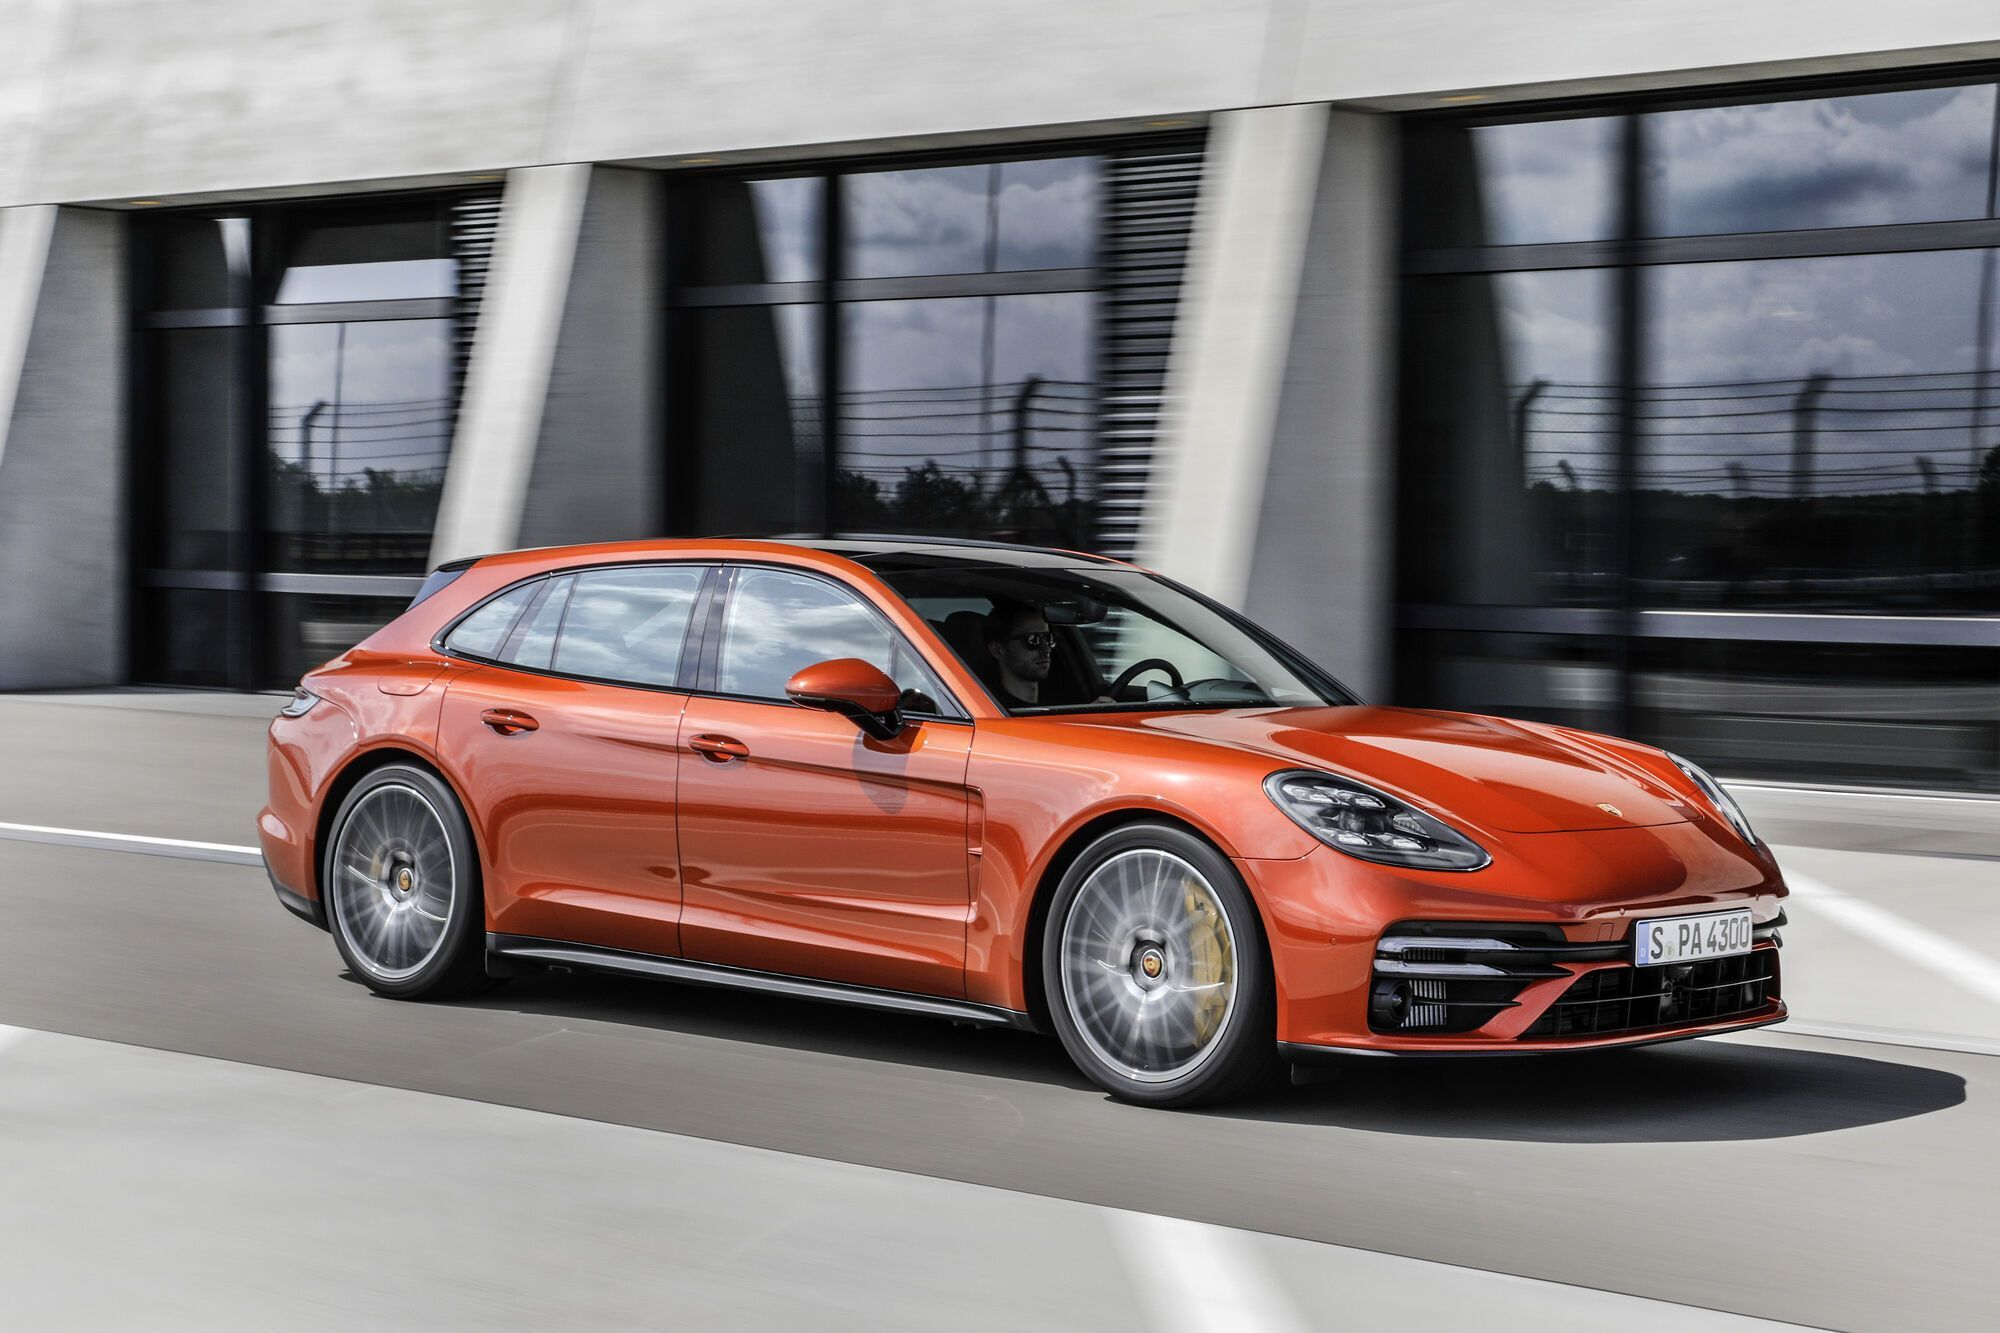 2021 Porsche Panamera Turbo S Panamera Turbo S Sport Turismo. фото: